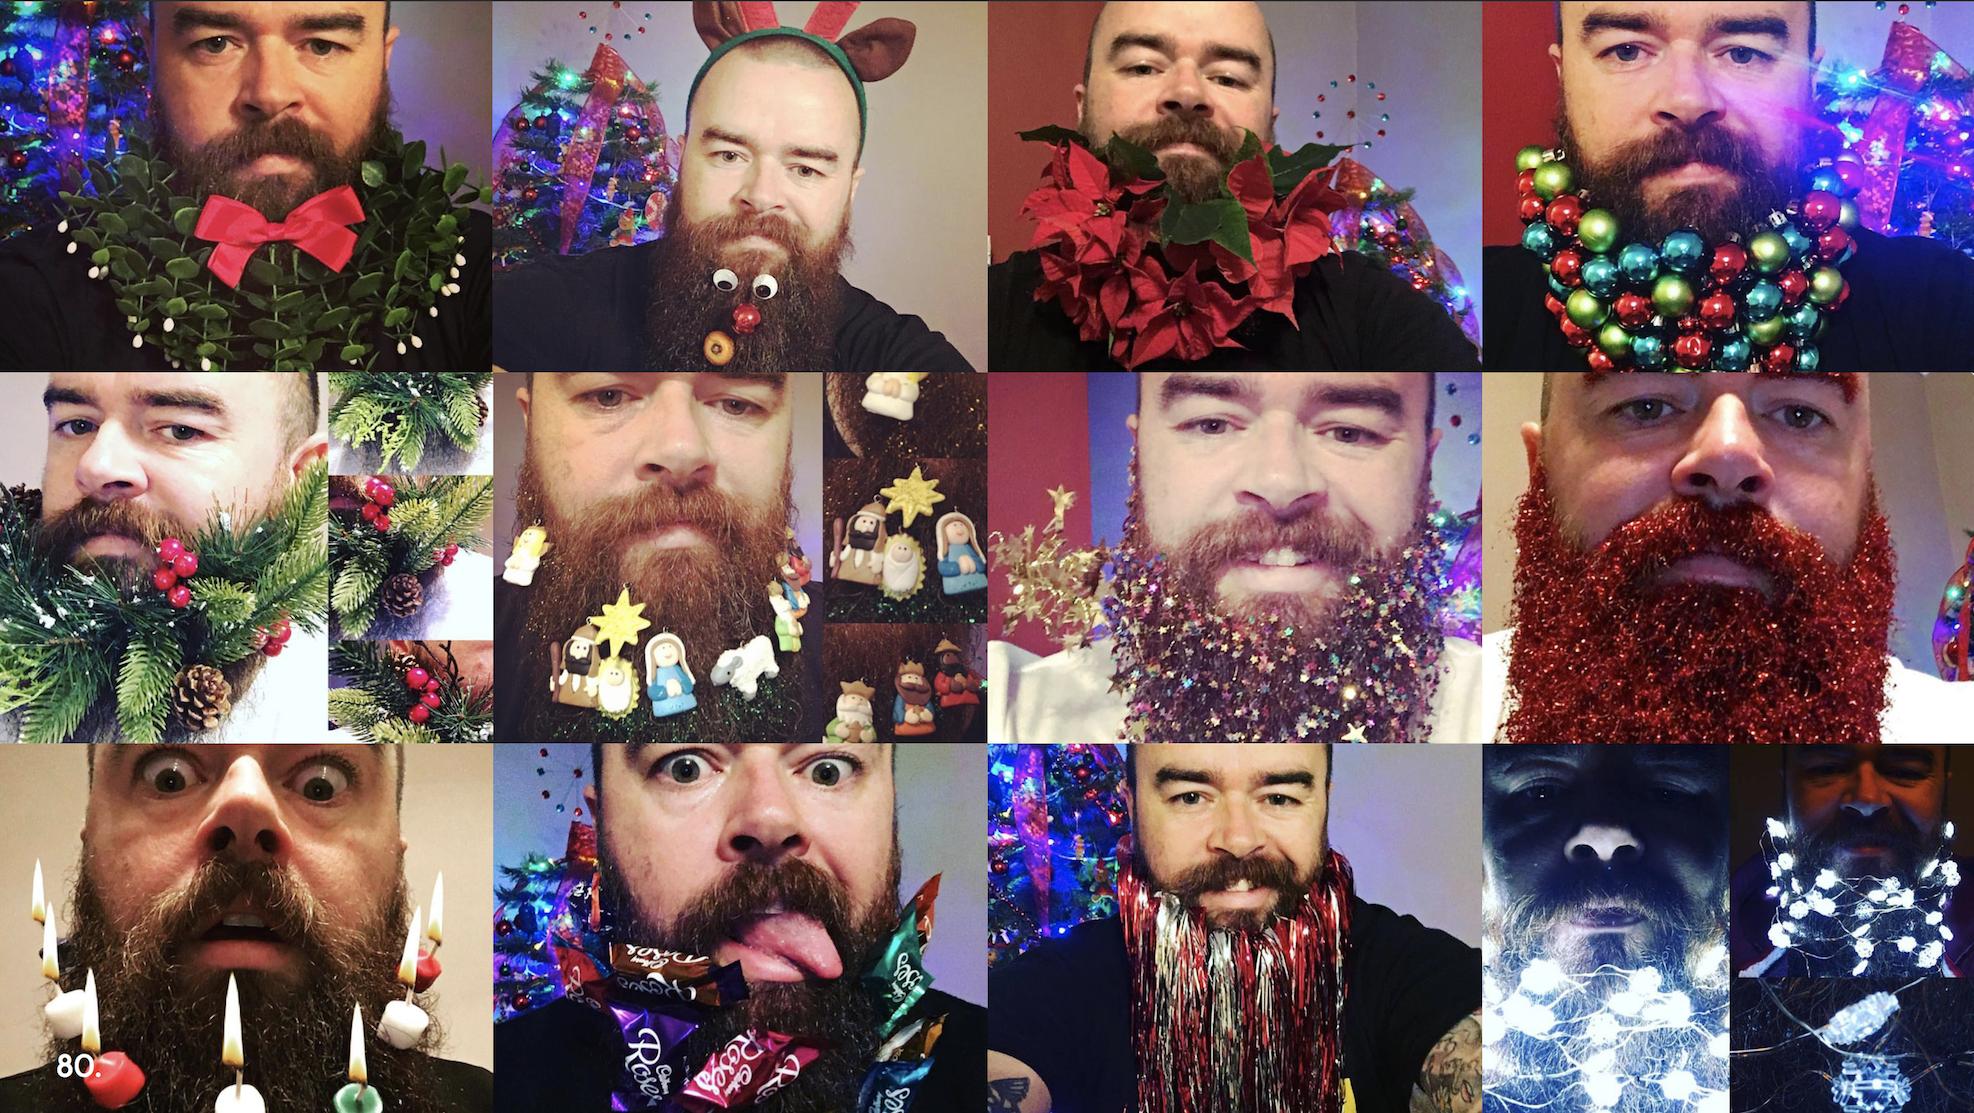 12 days of bearded Christmas